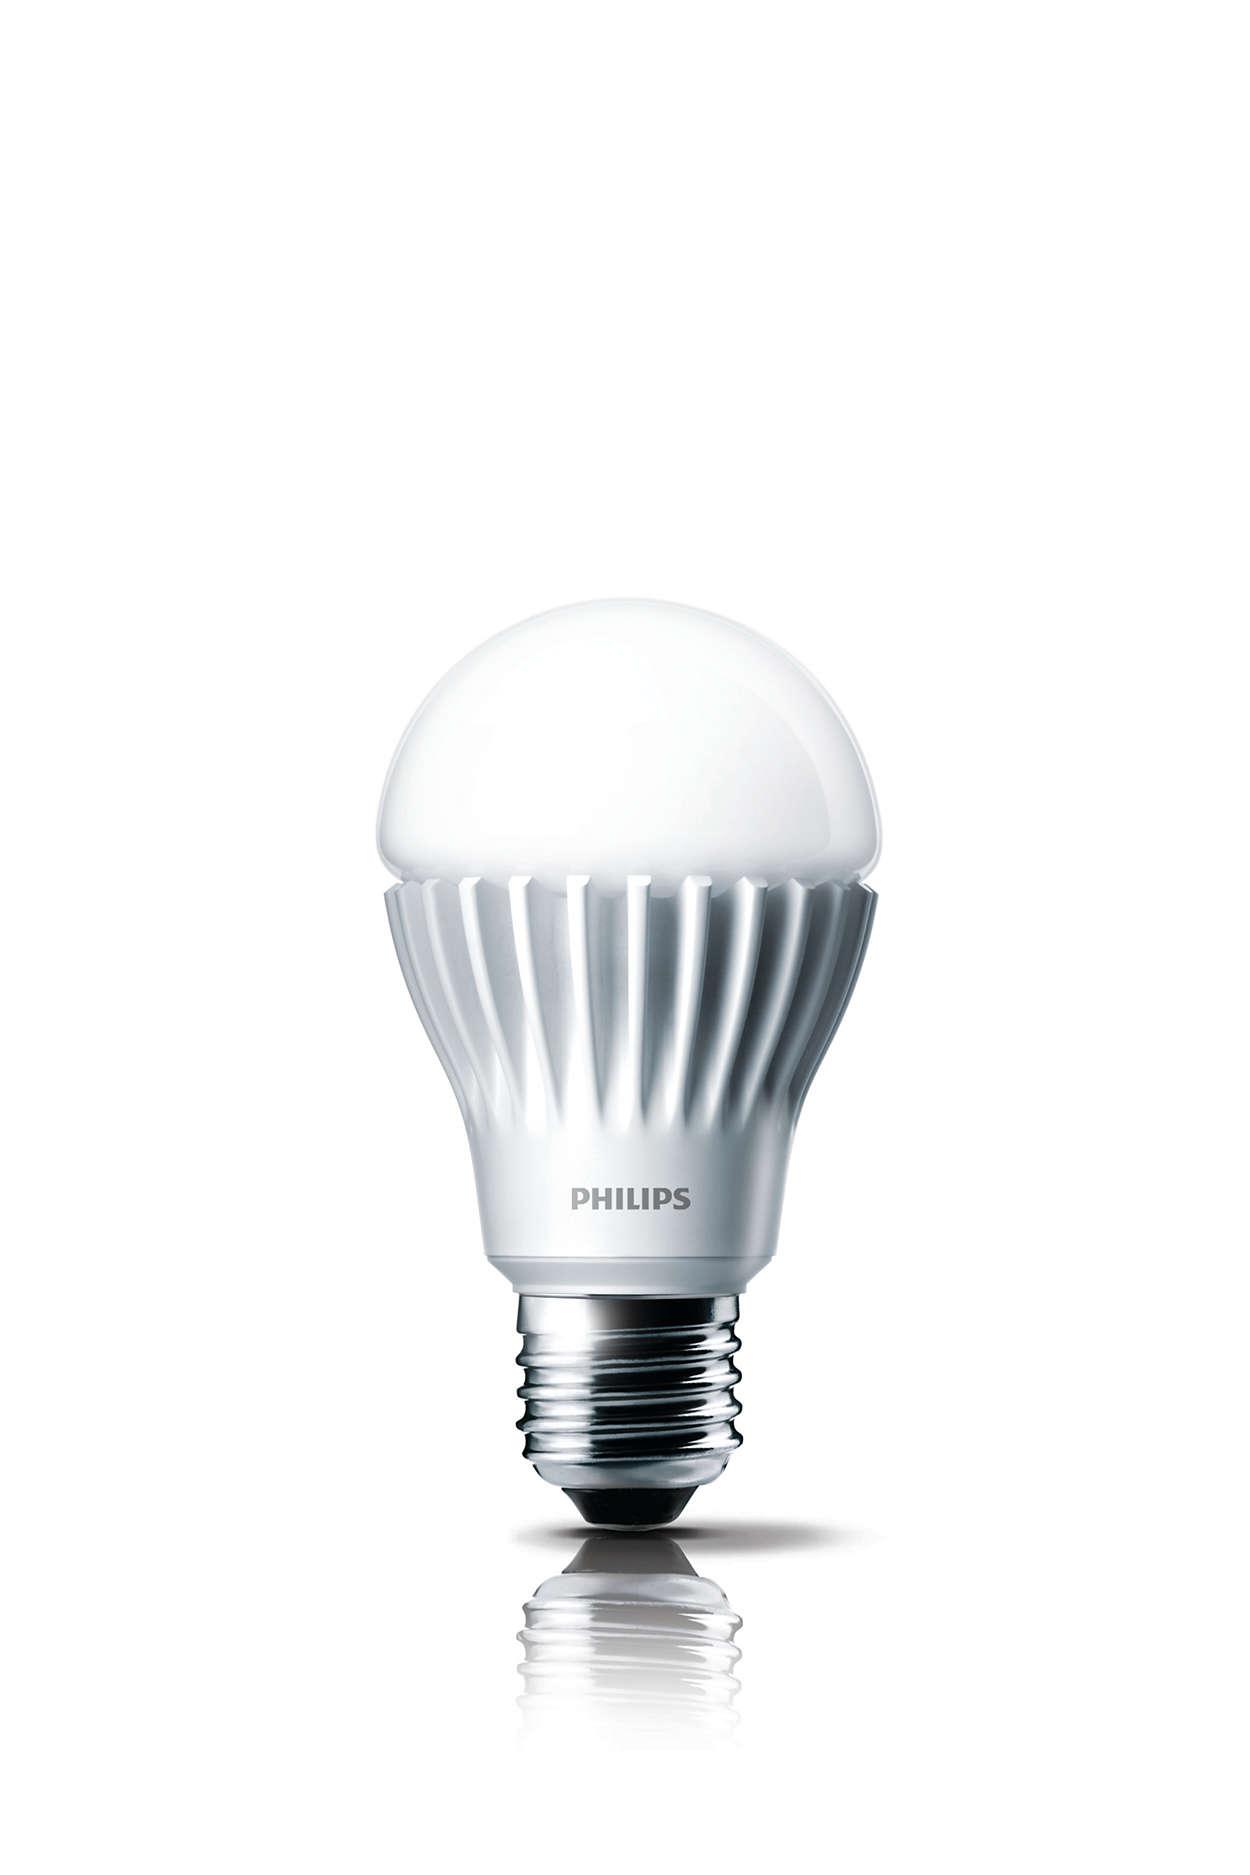 Optimale lichtkwaliteit, optimale energiebesparing